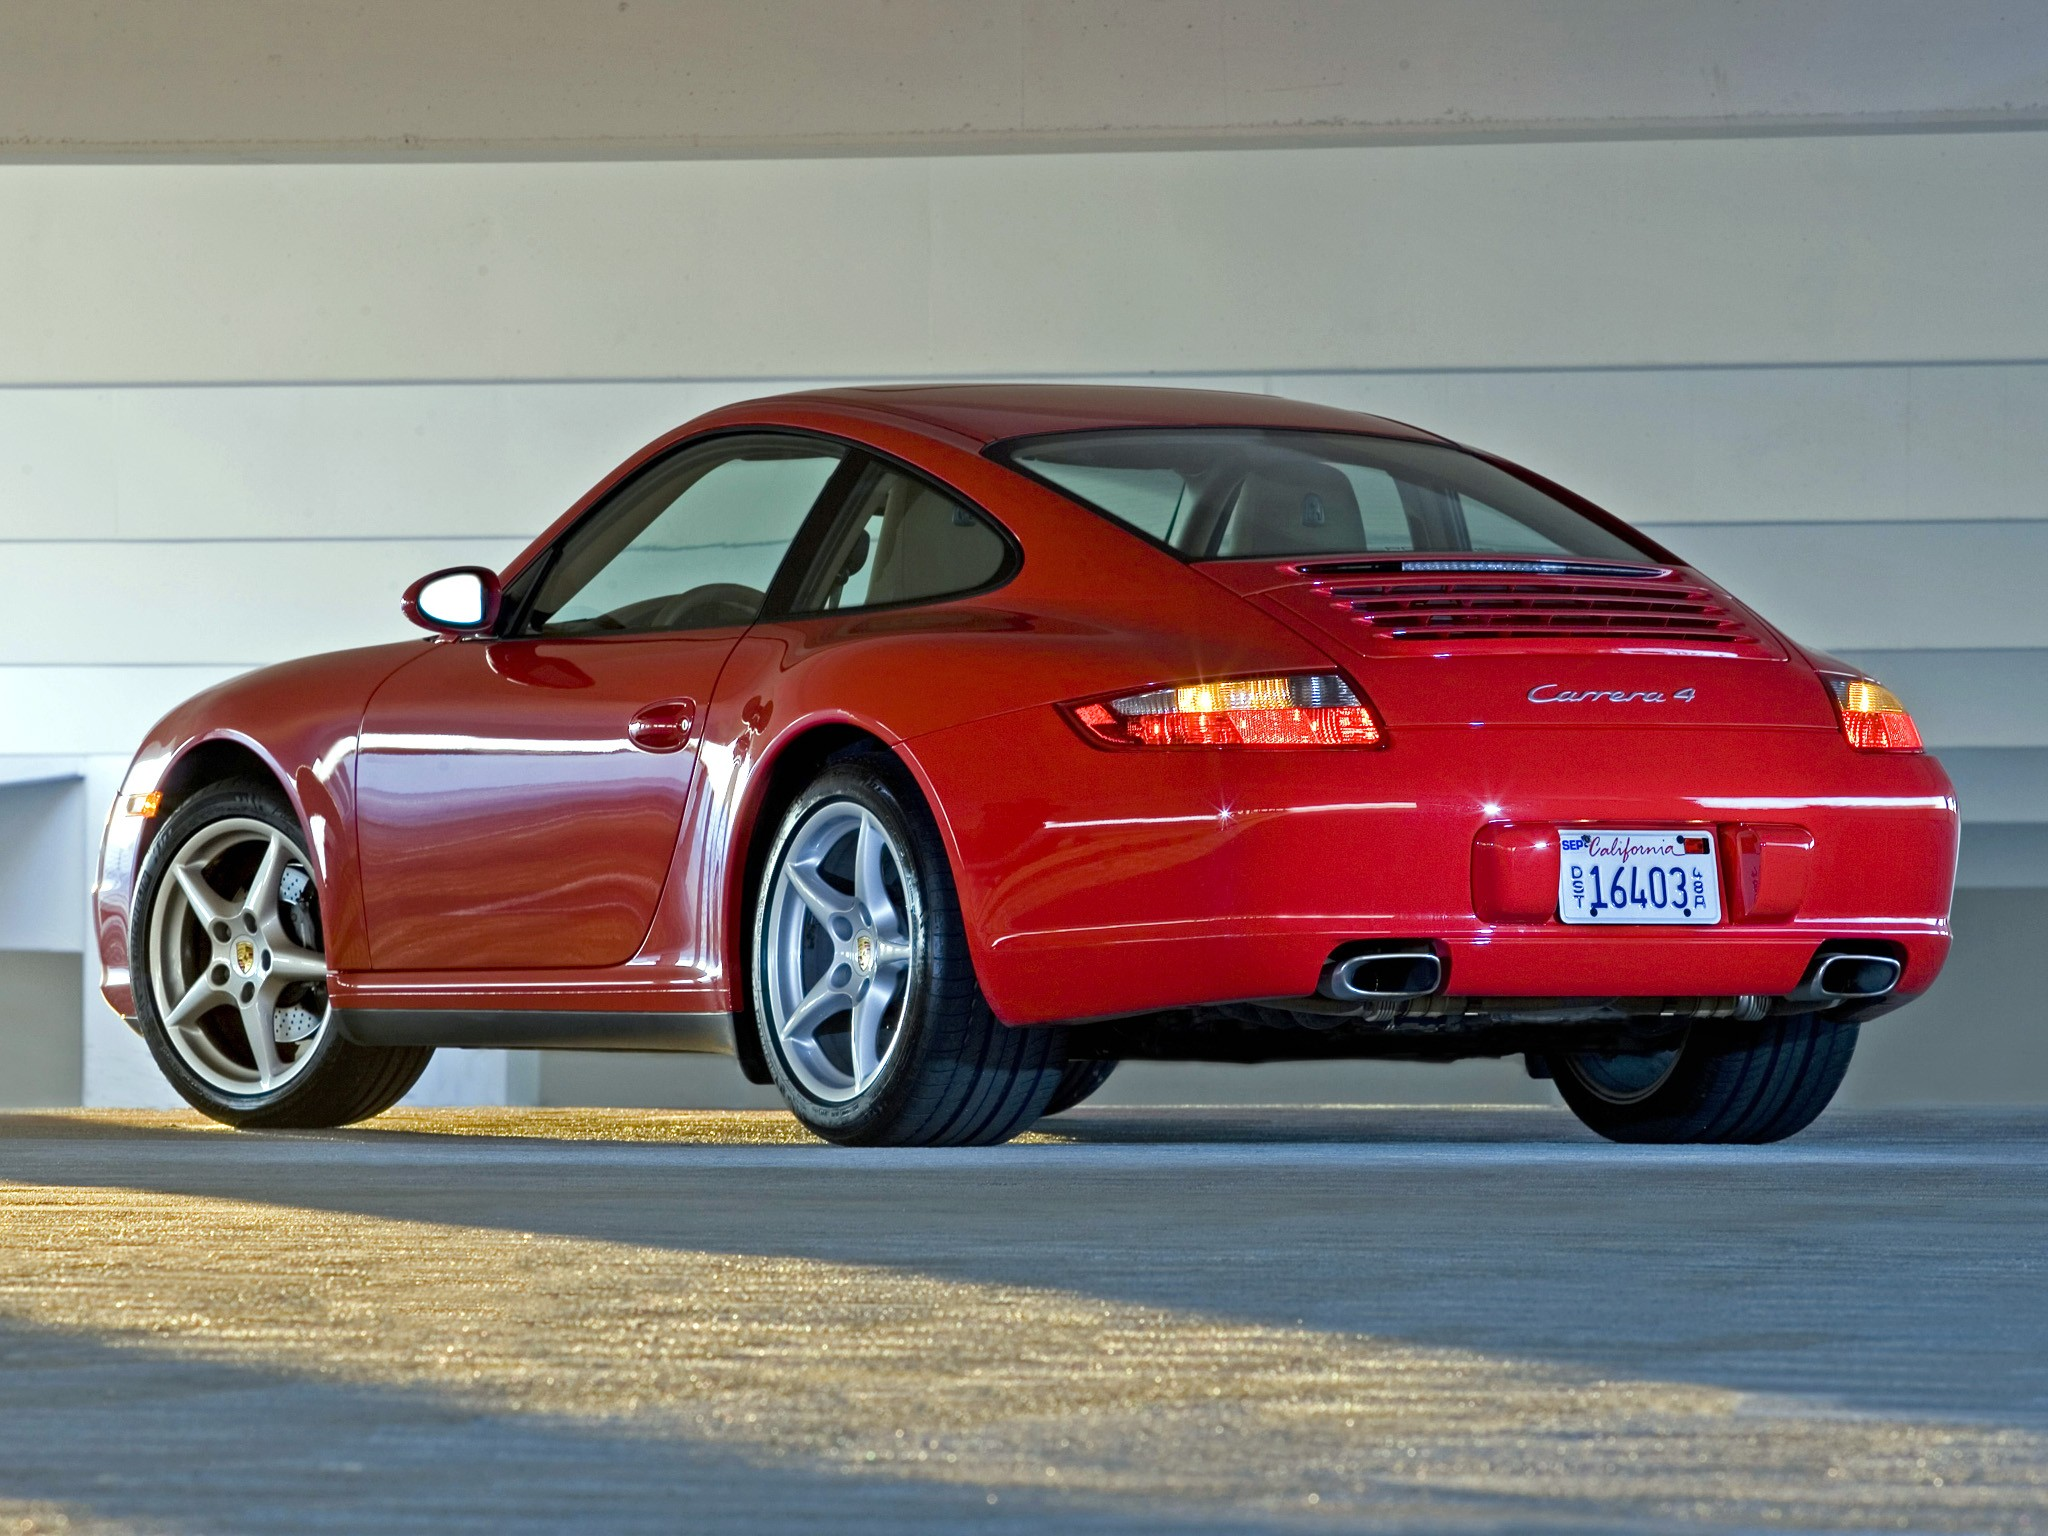 Porsche 911 Carrera 4 997 2005 2006 2007 2008